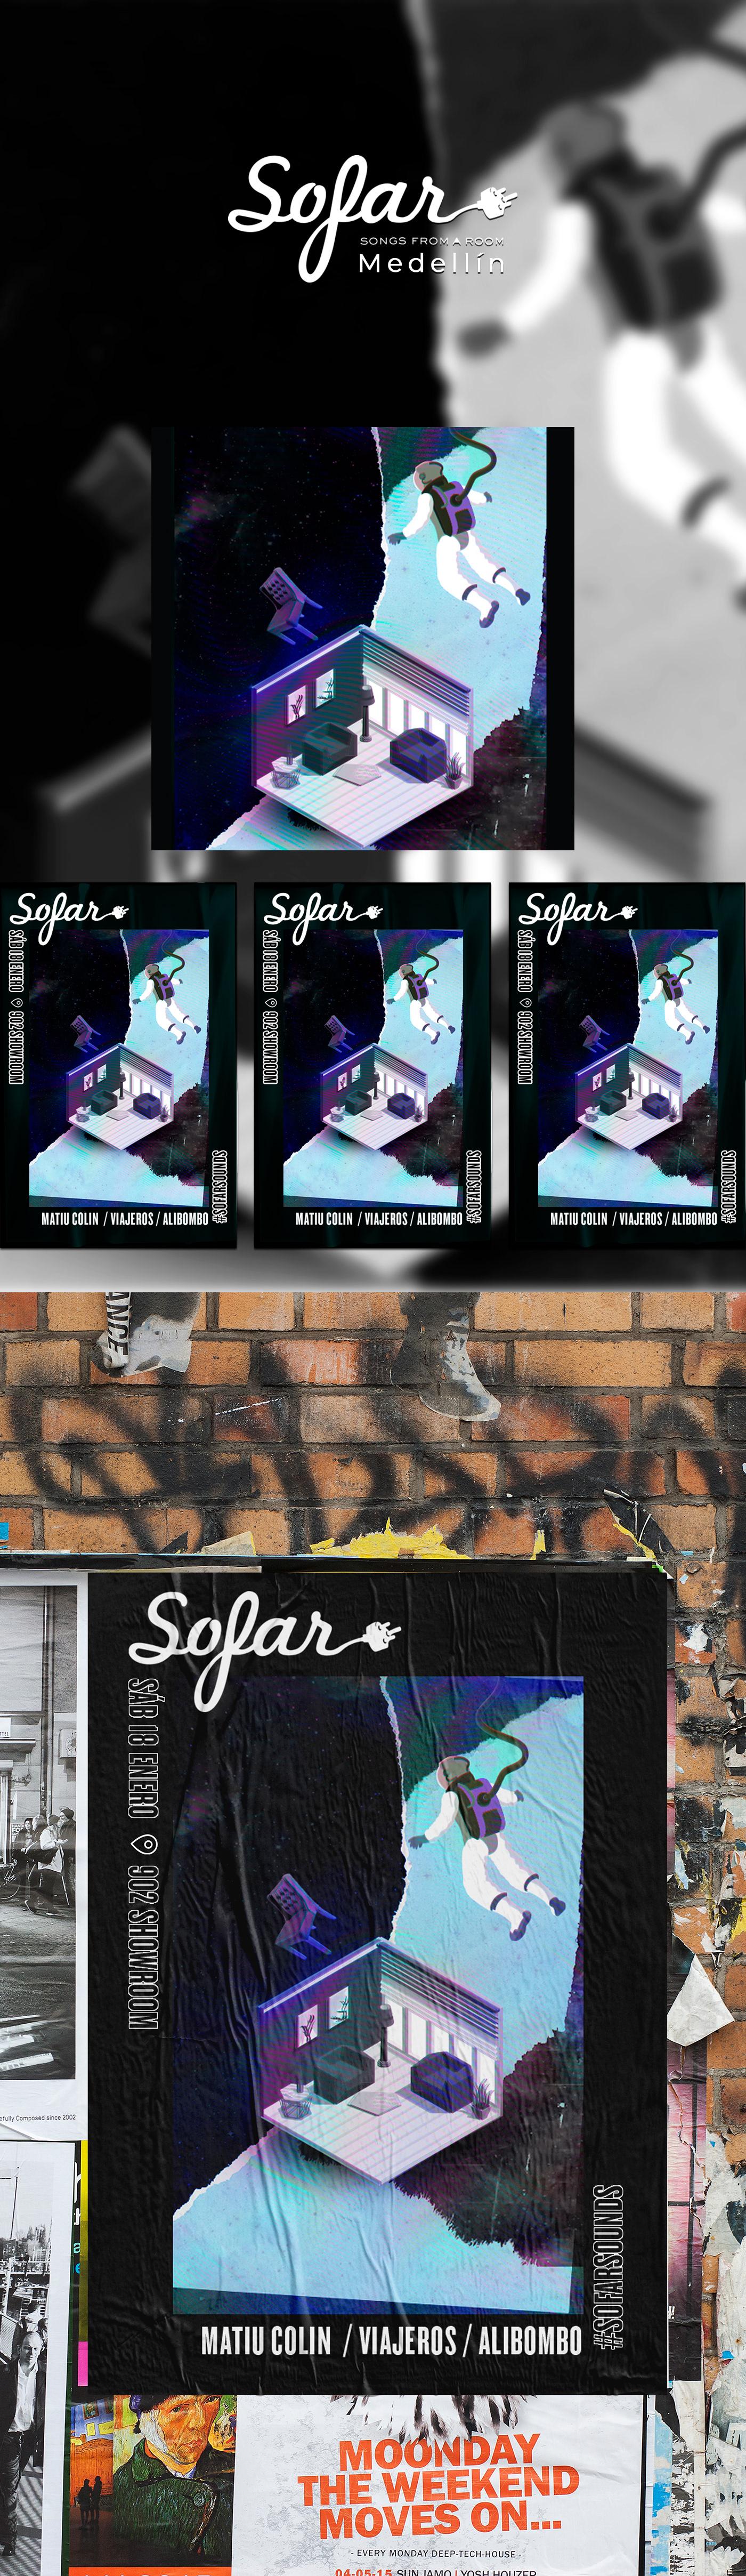 collage Digital Art  Glitch Graphip design  indie music musica poster Poster Design universe